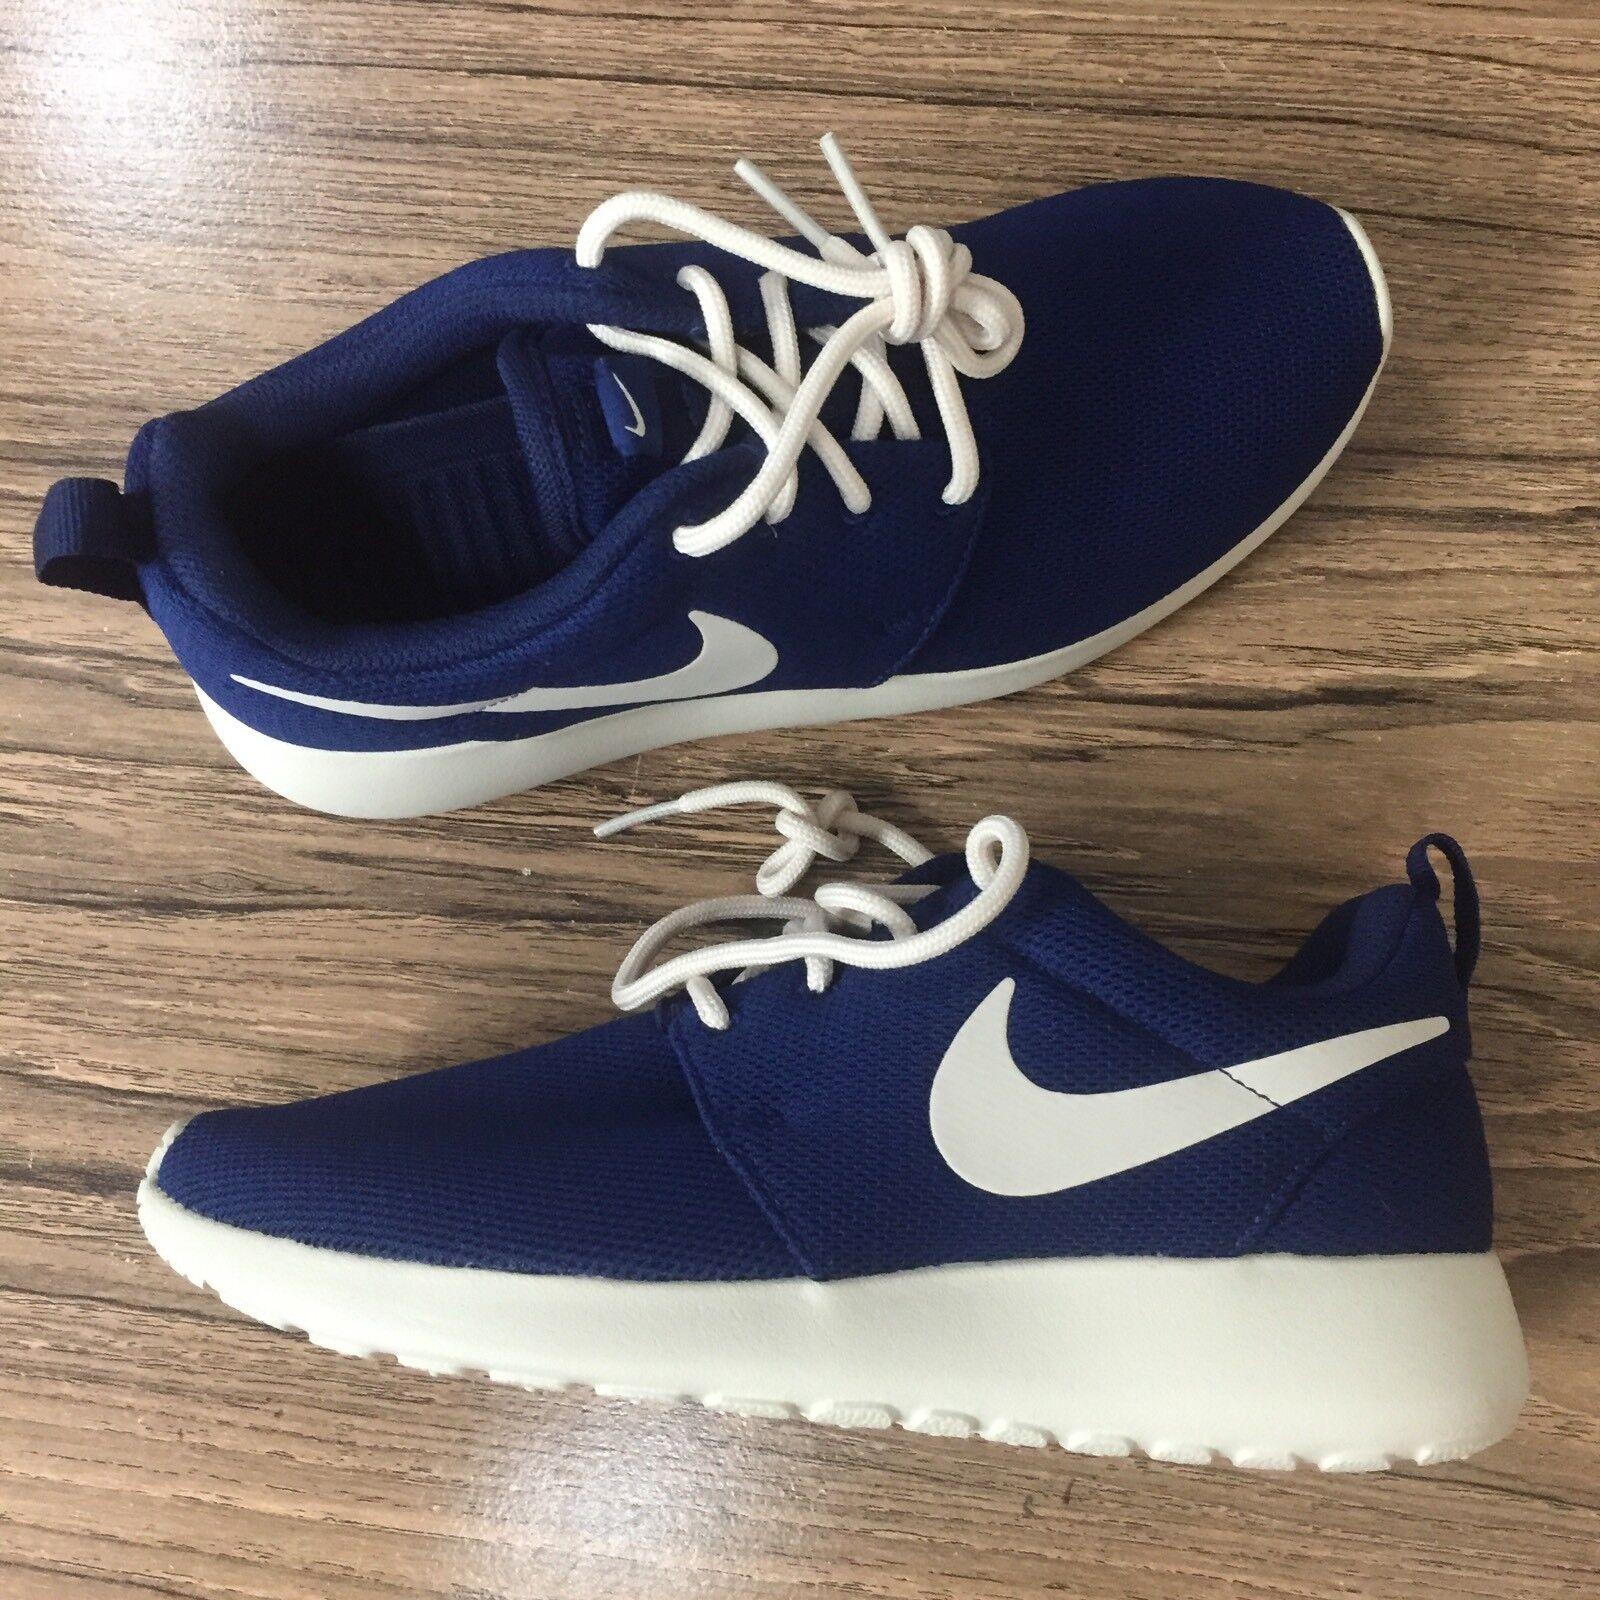 A338 Nike Womens Roshe One Running Blue NEW Oatmeal 511882-404 Size 5.5 NEW Blue 665cff